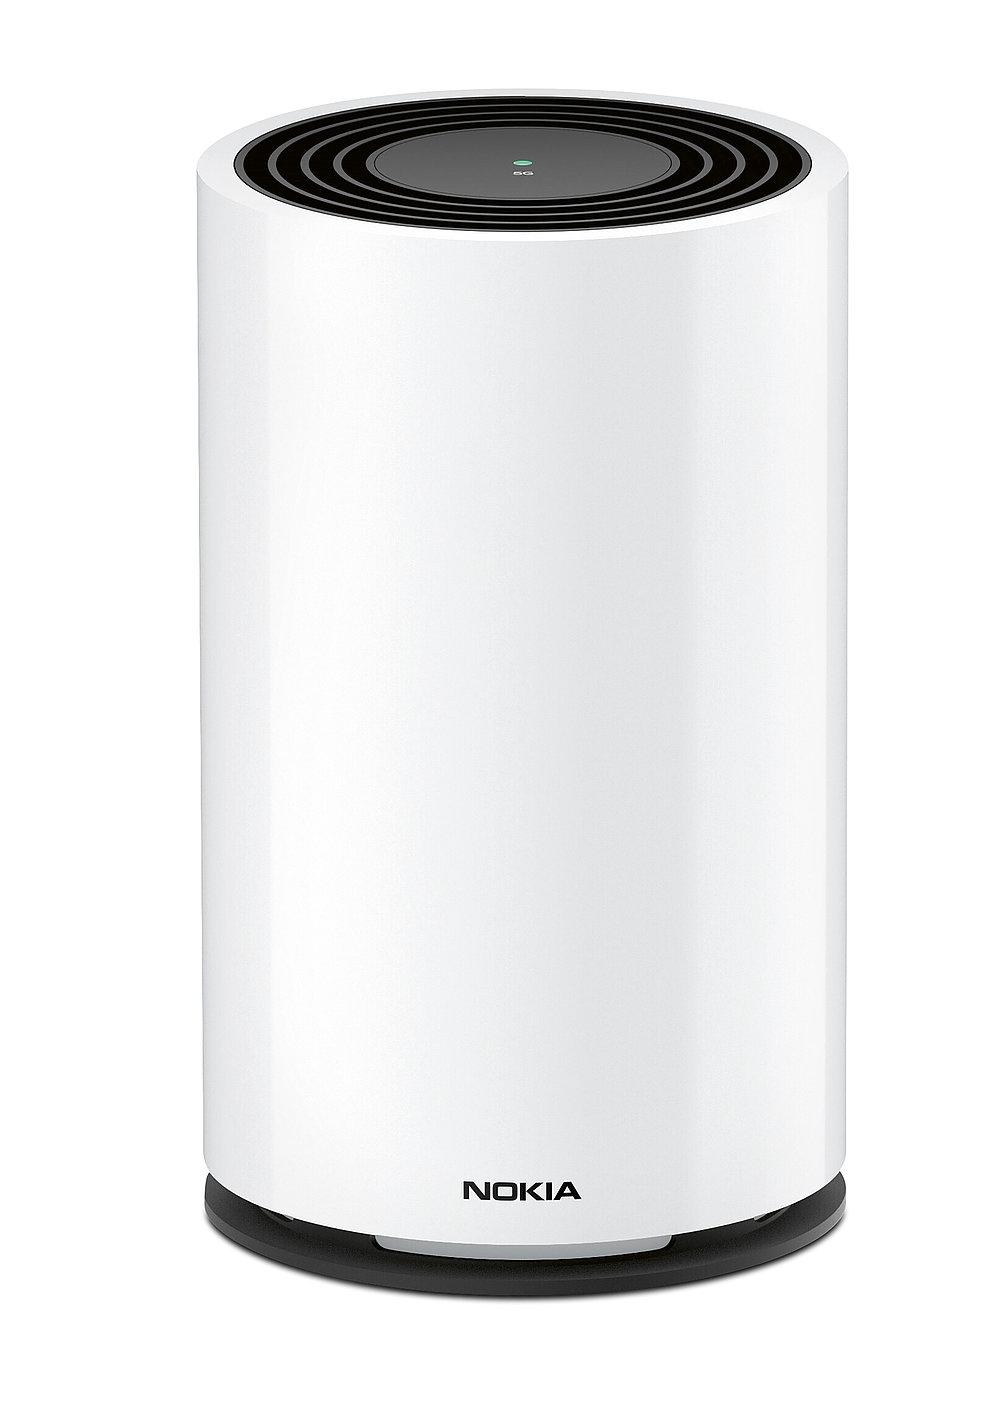 Nokia FastMile 5G Gateway | Red Dot Design Award